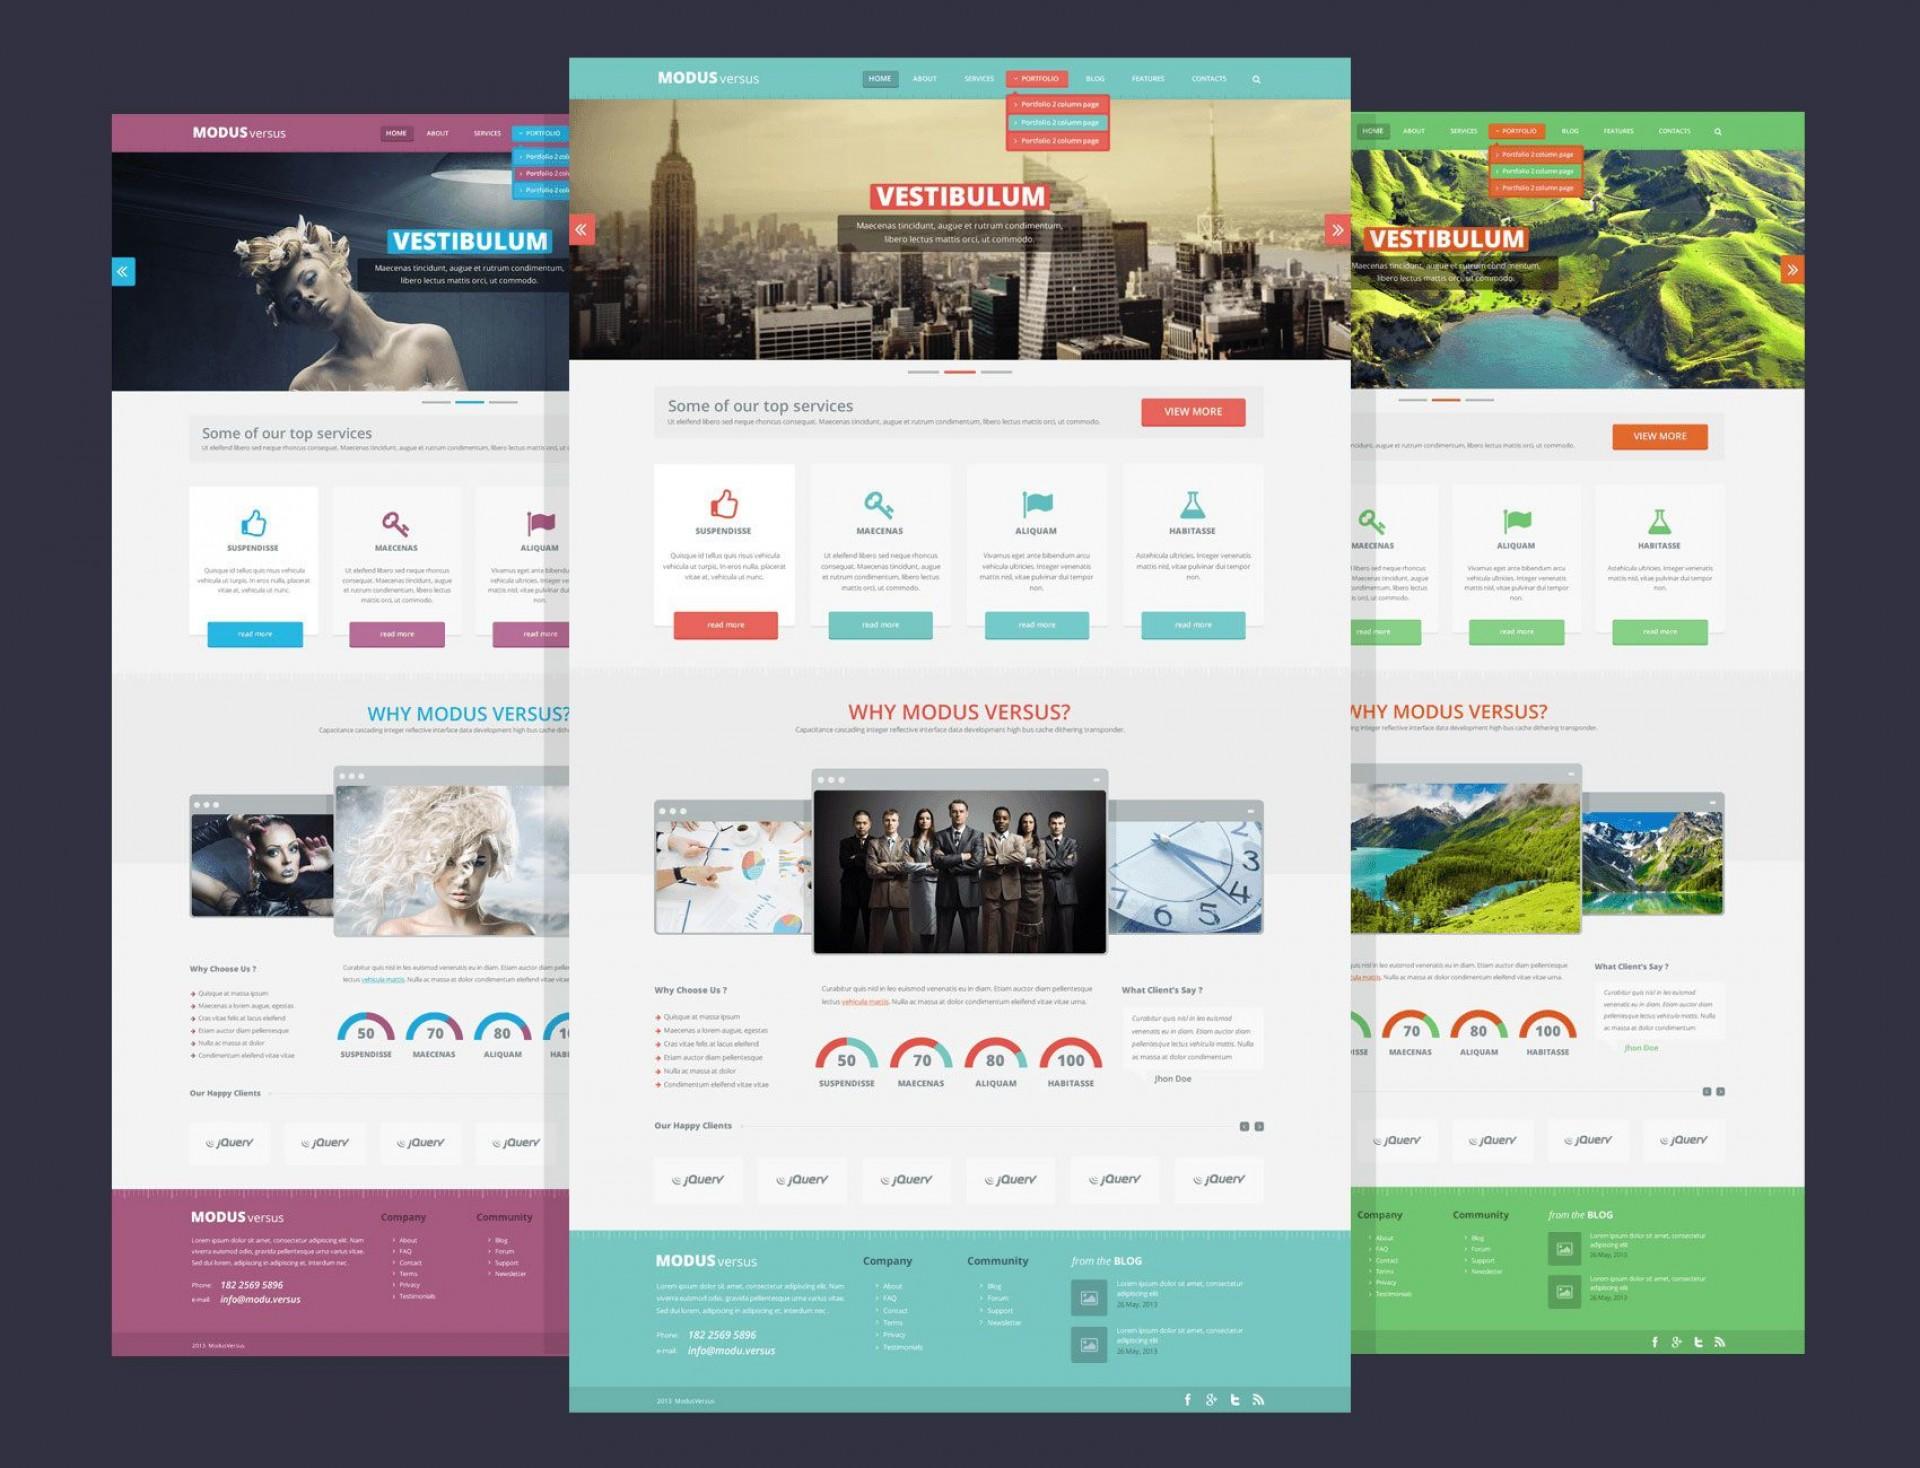 004 Incredible Website Design Template Free Image  Asp.net Web Download Psd1920